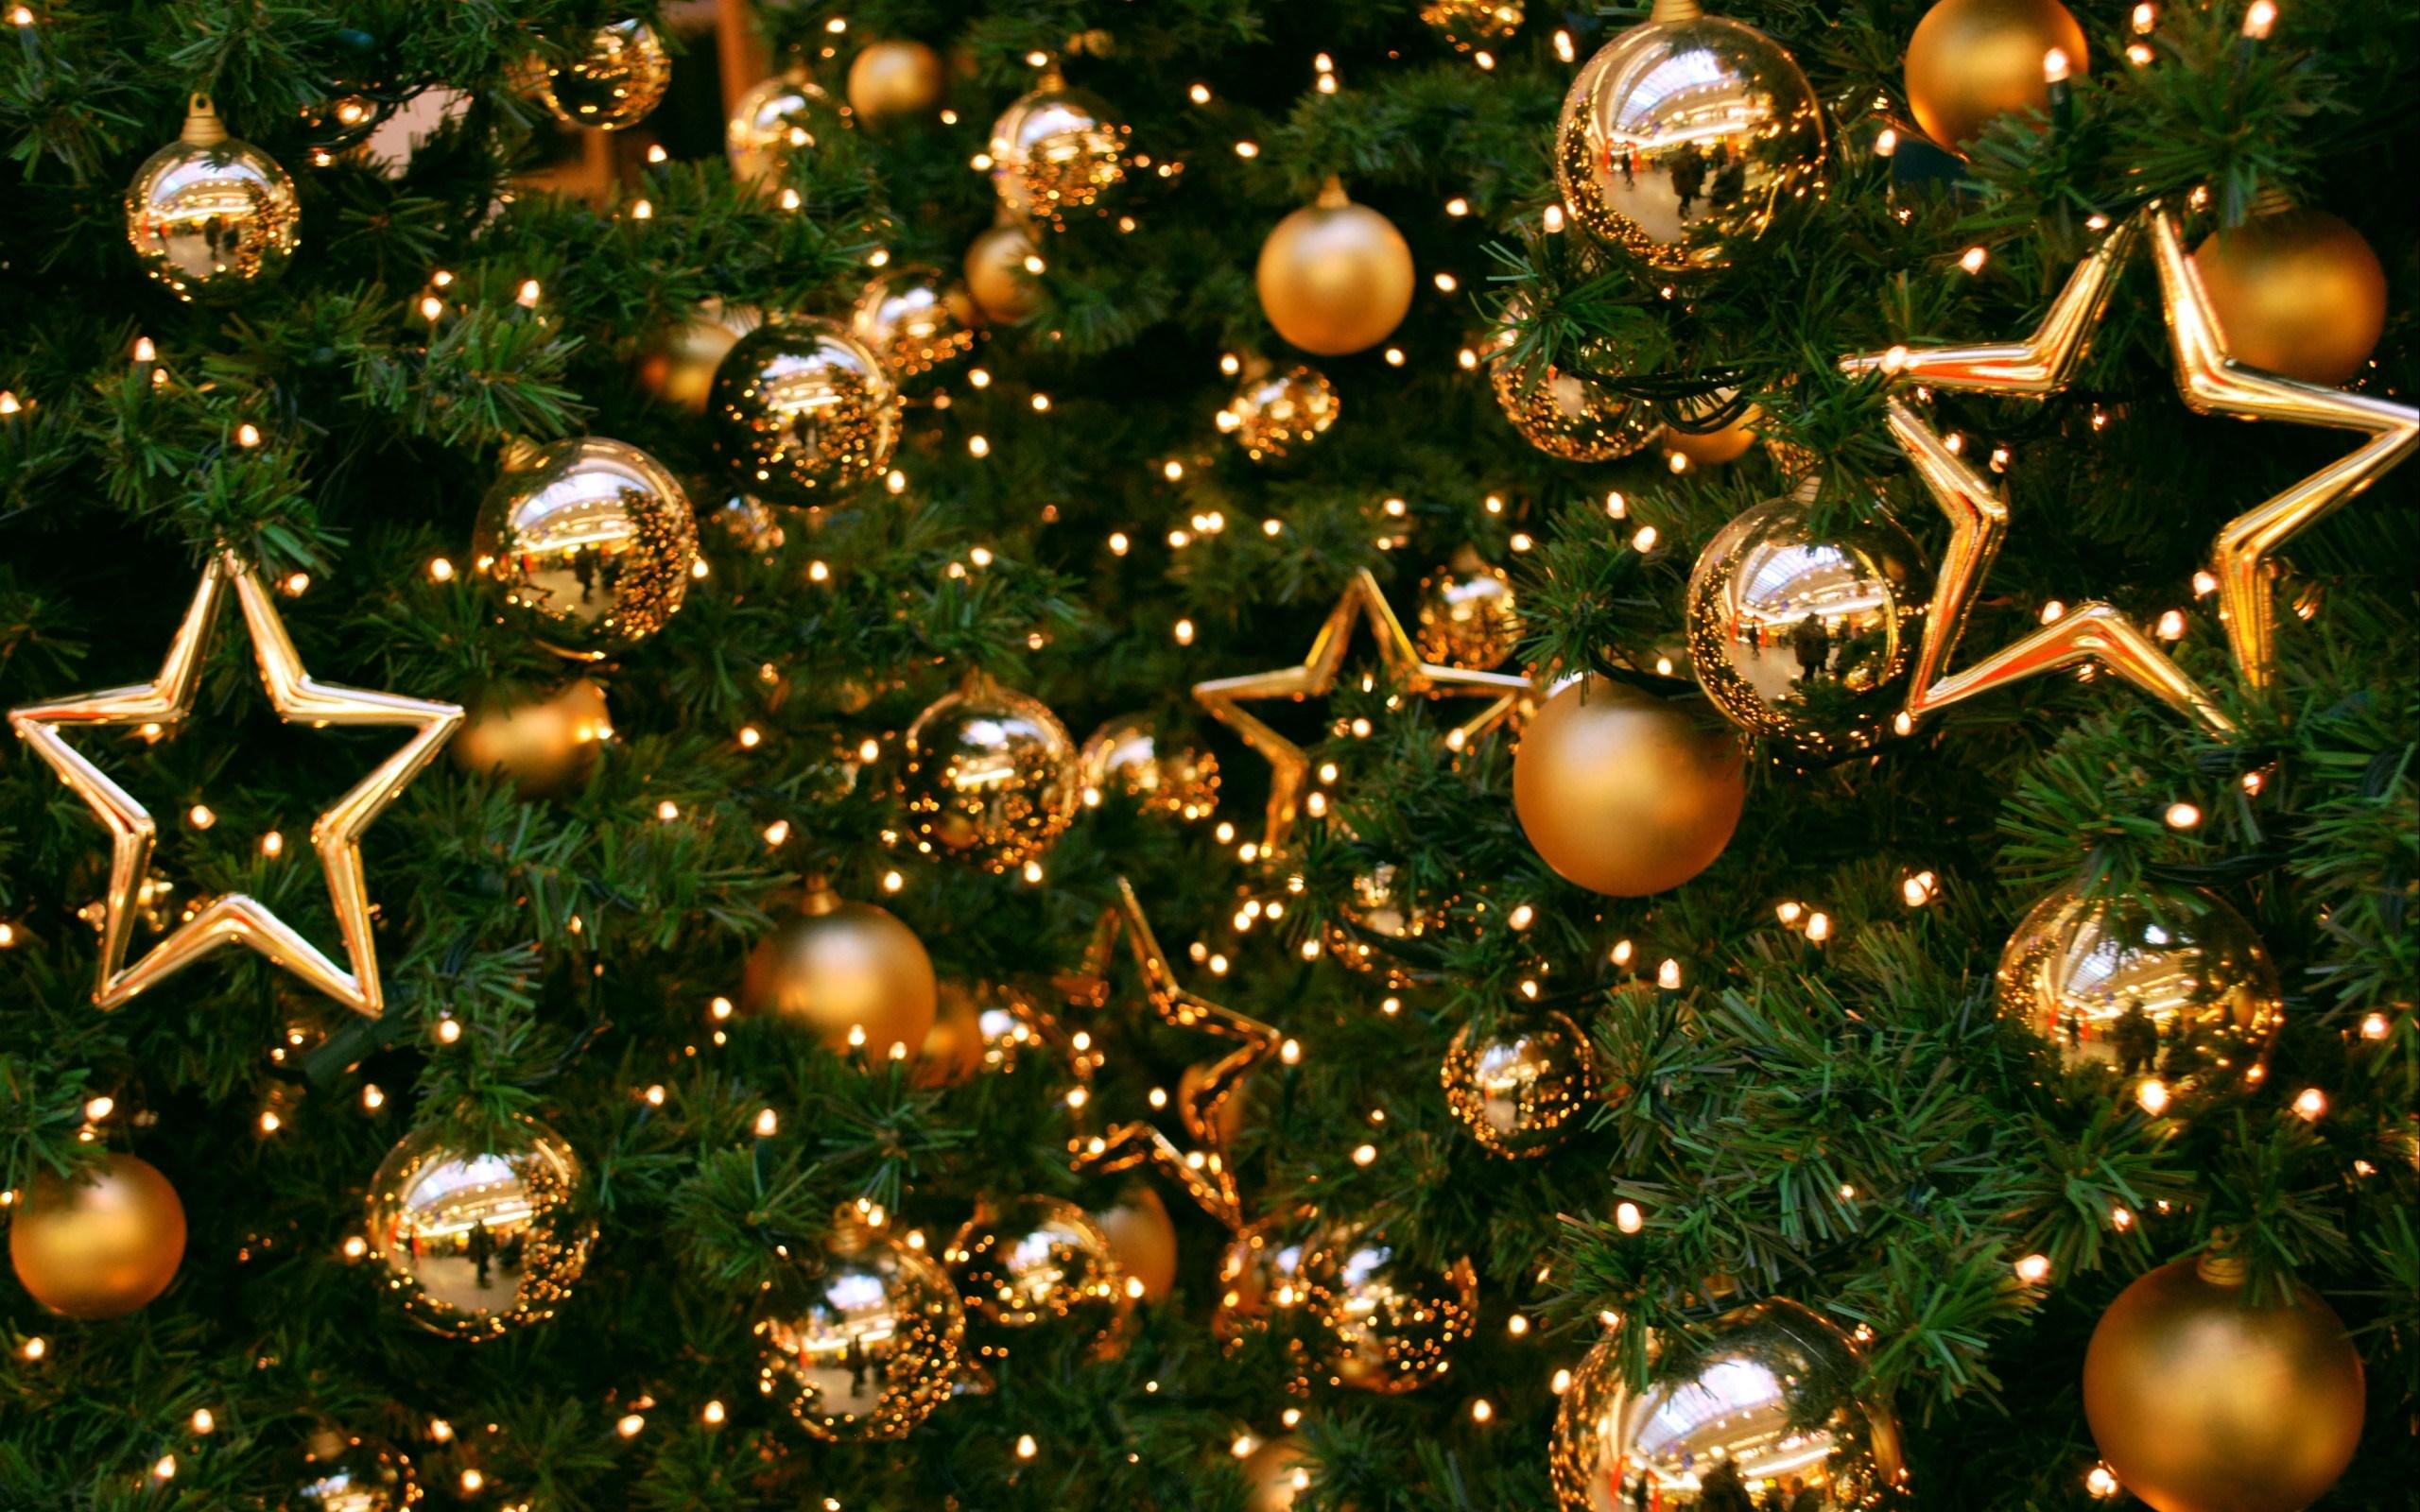 Wonderful Holiday Decorations Wallpaper 6816192 2560x1600